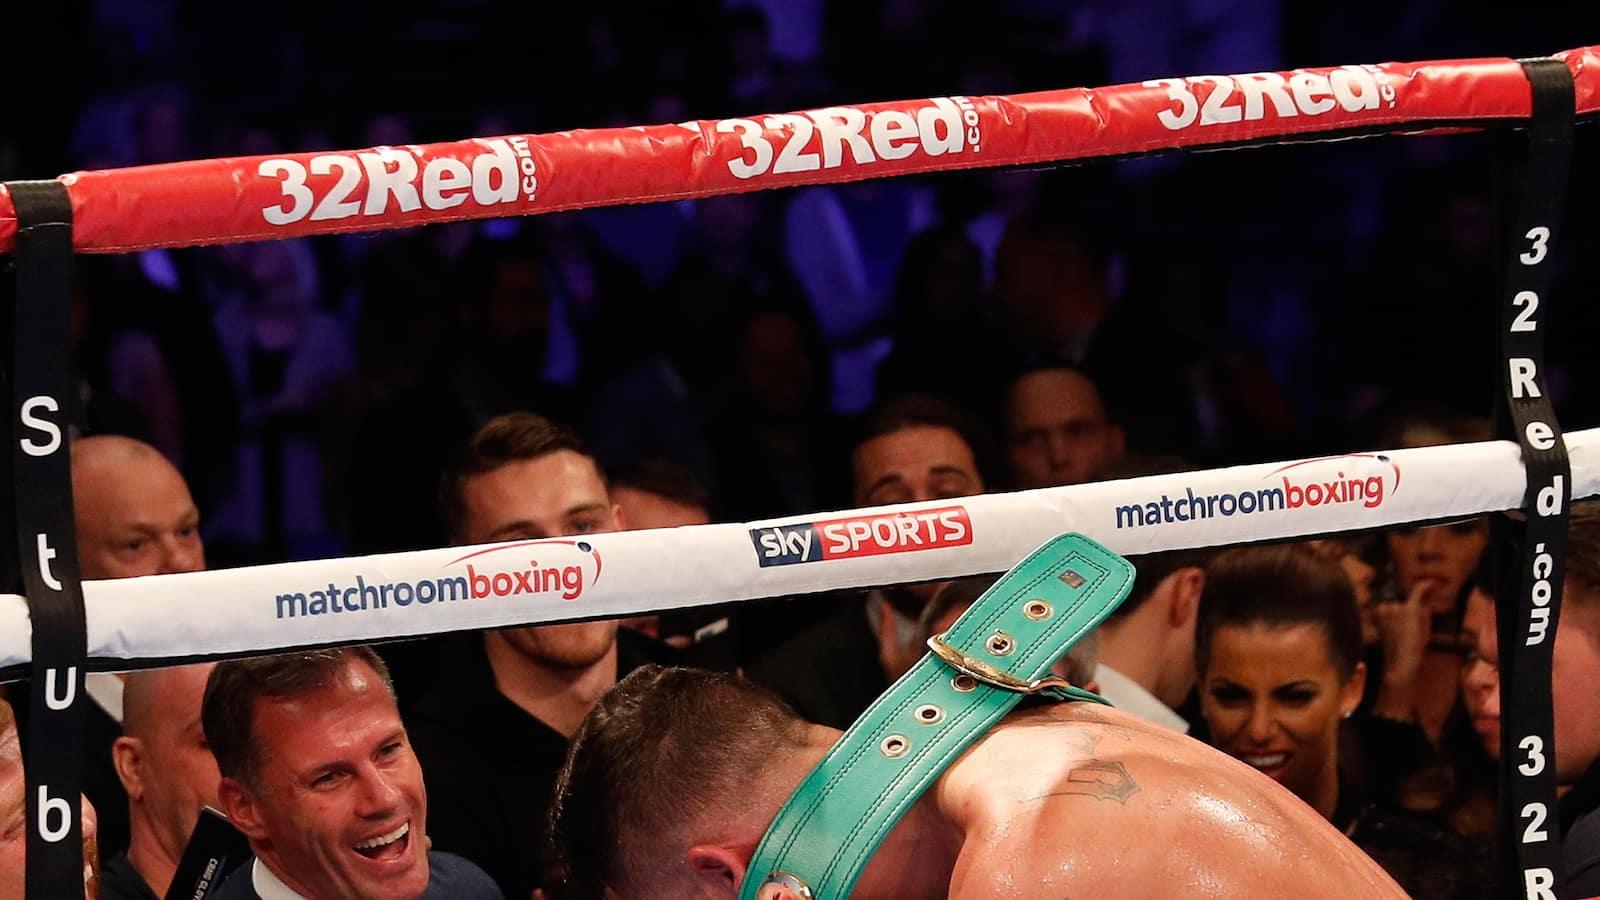 boksning/matchroom-boxing